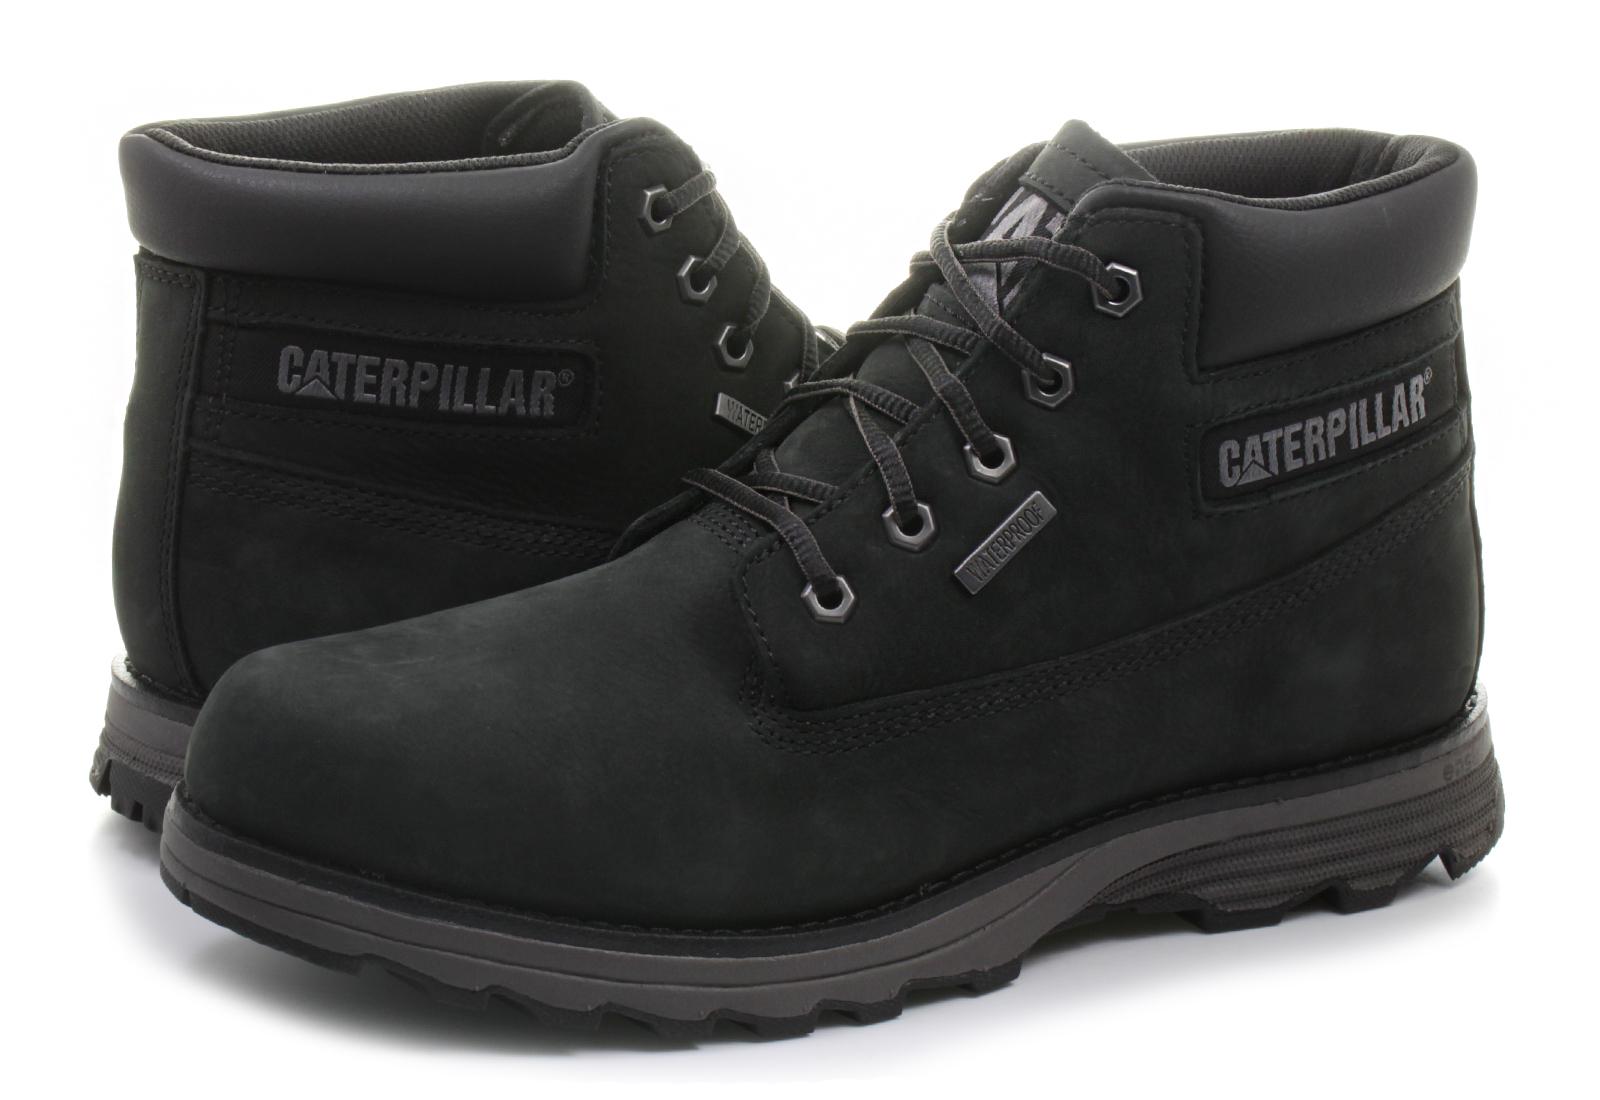 Cat Bakancs - Founder Waterproof - 721592-blk - Office Shoes ... 53b52f664f